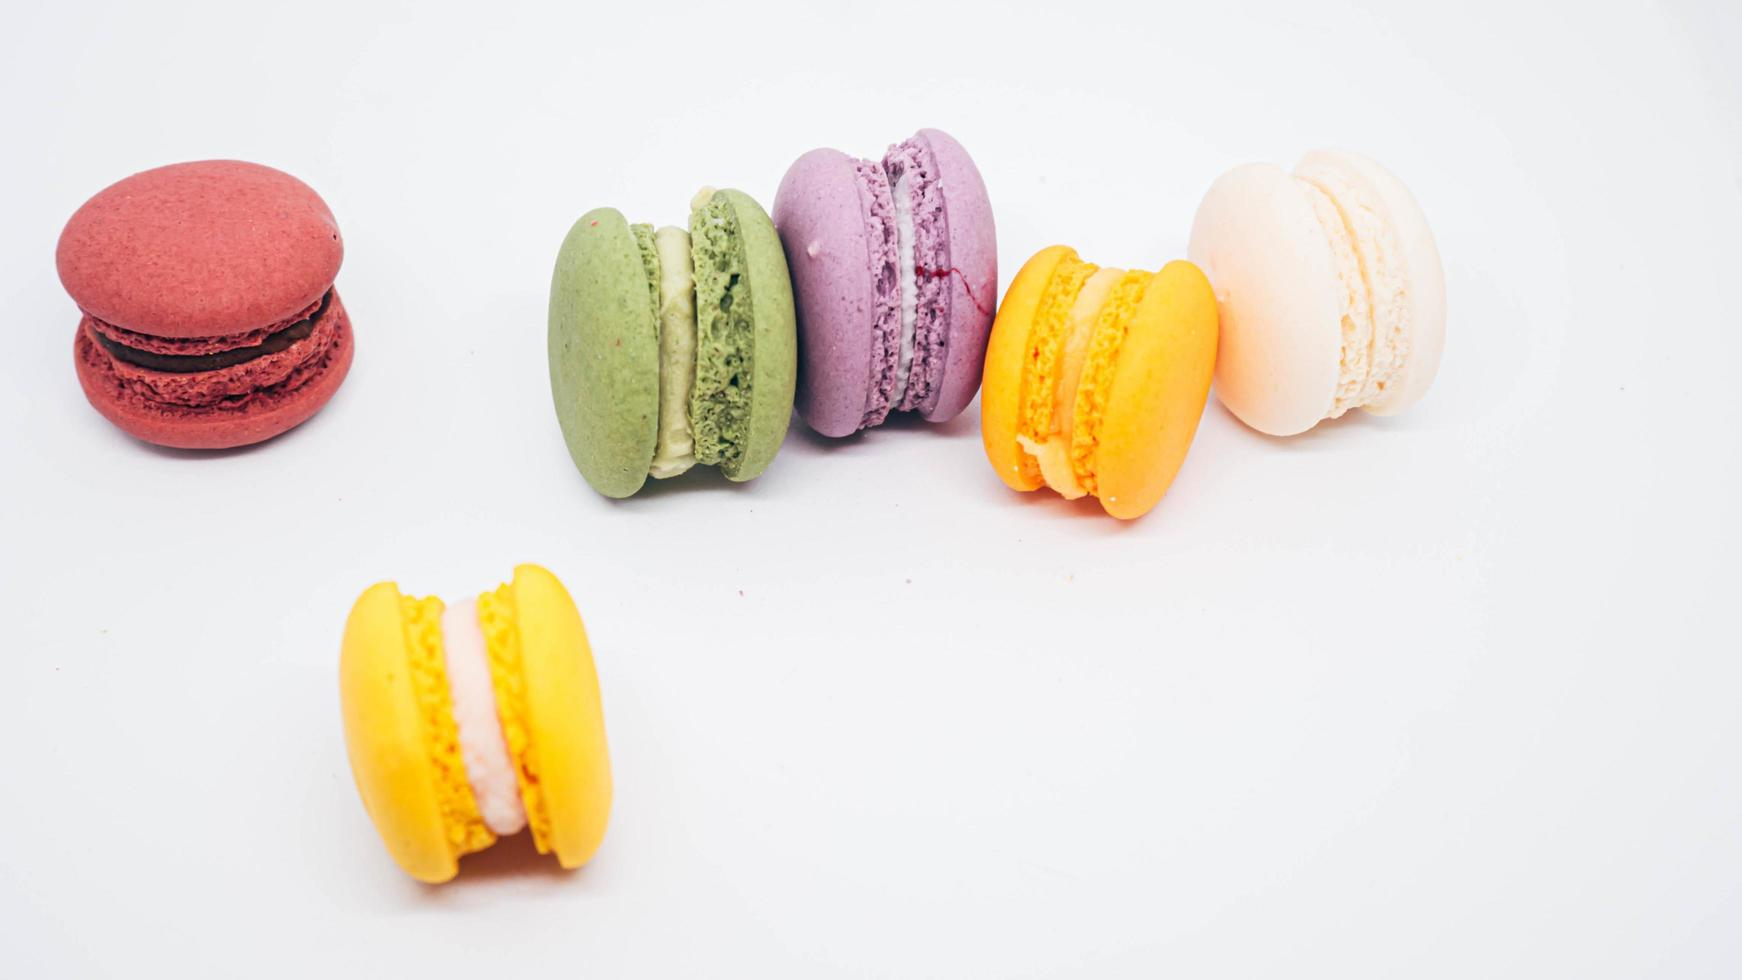 macarons de colores pastel foto